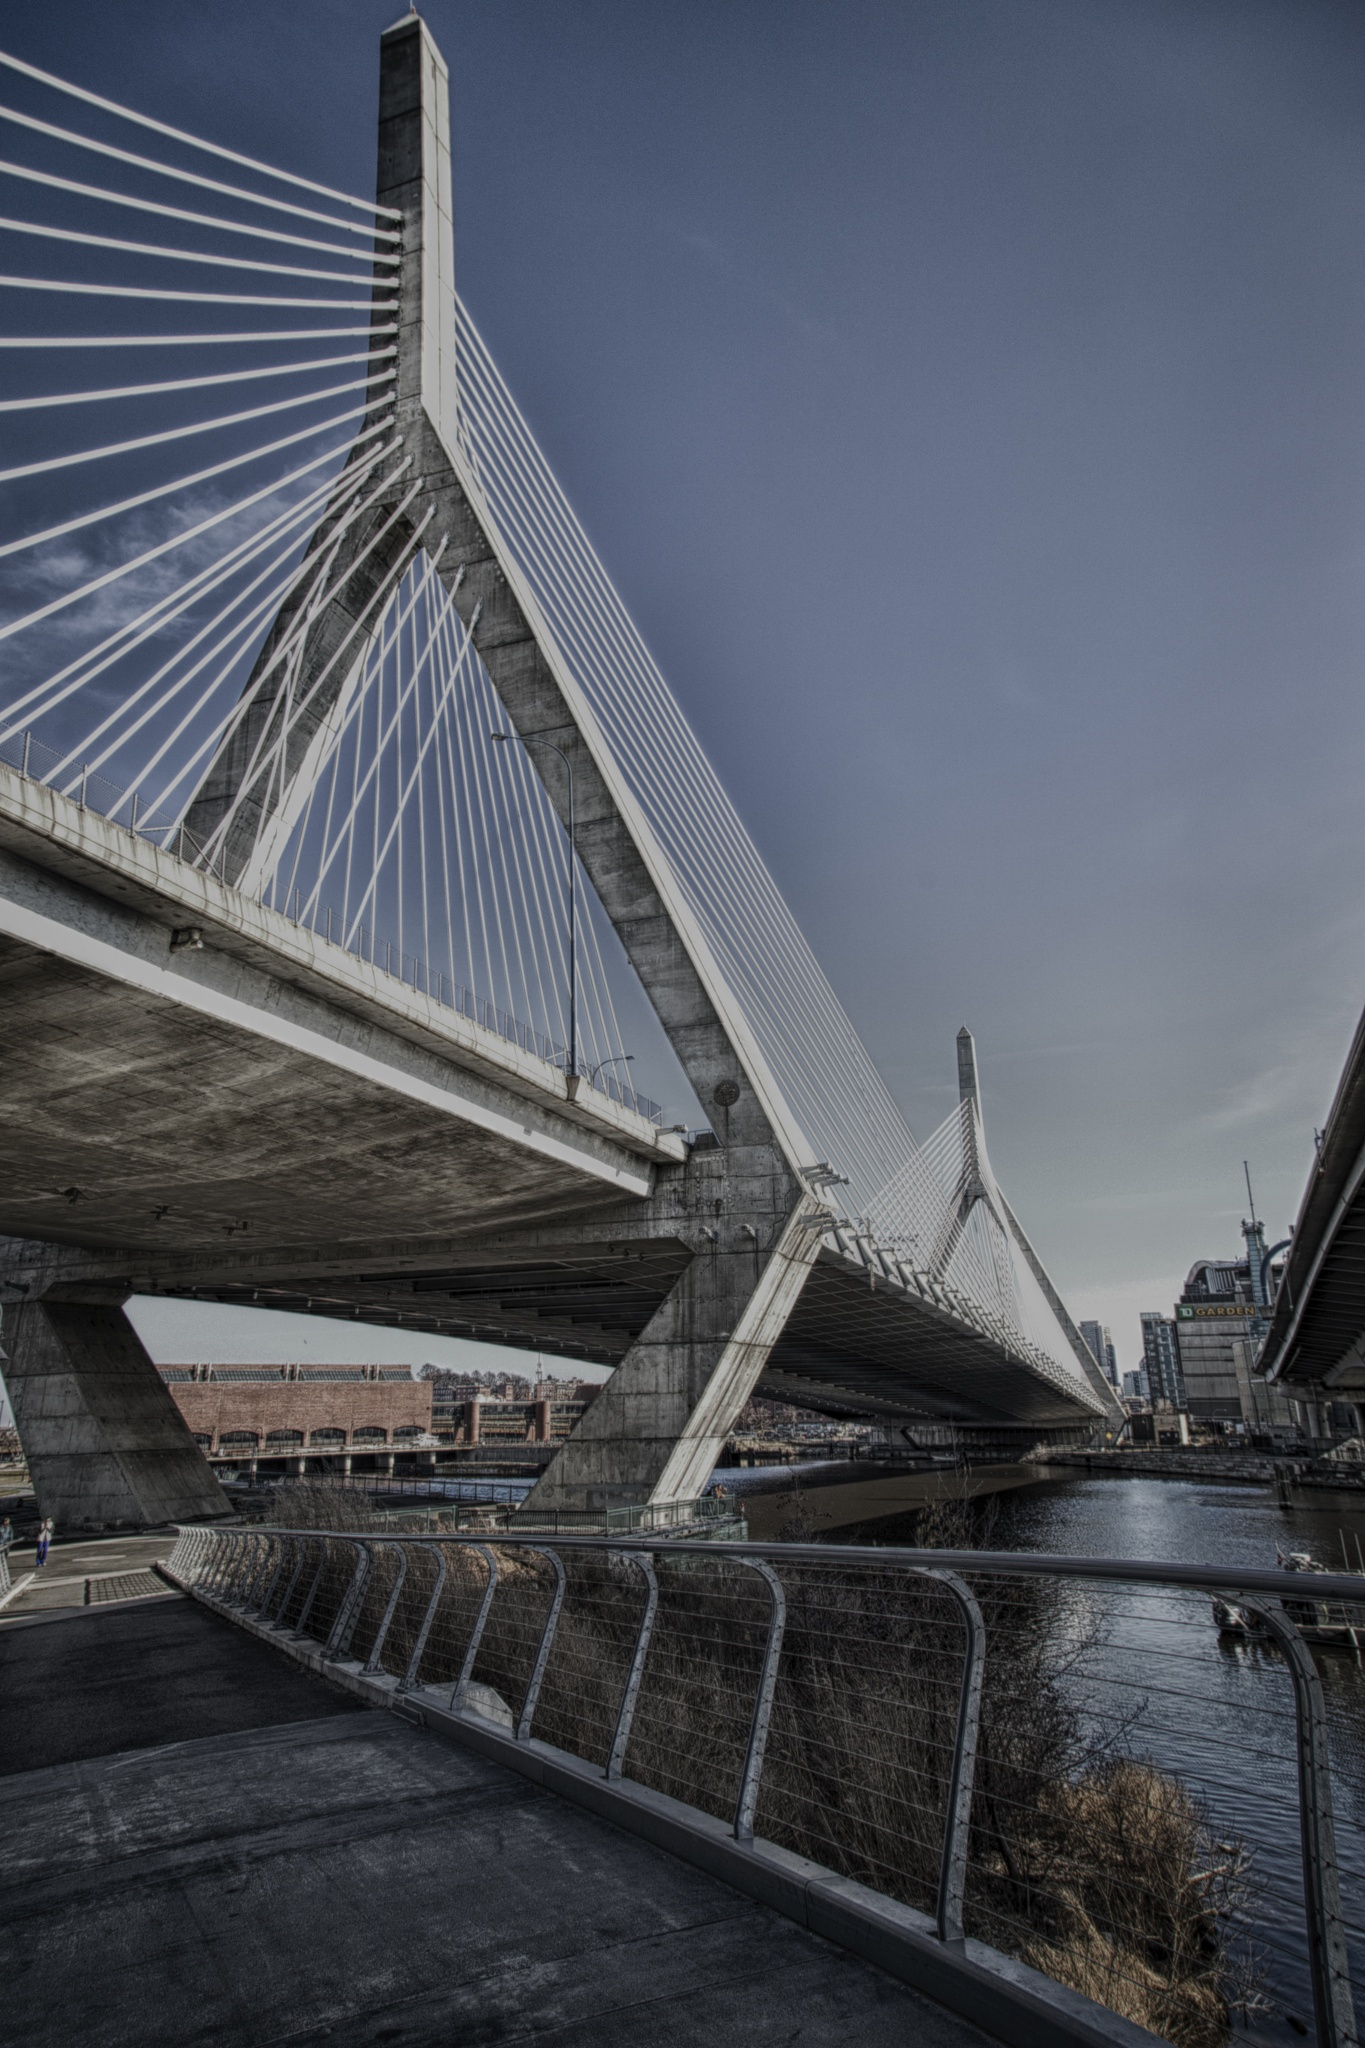 The Leonard P Zakim Bridge by stephen.venuto.1